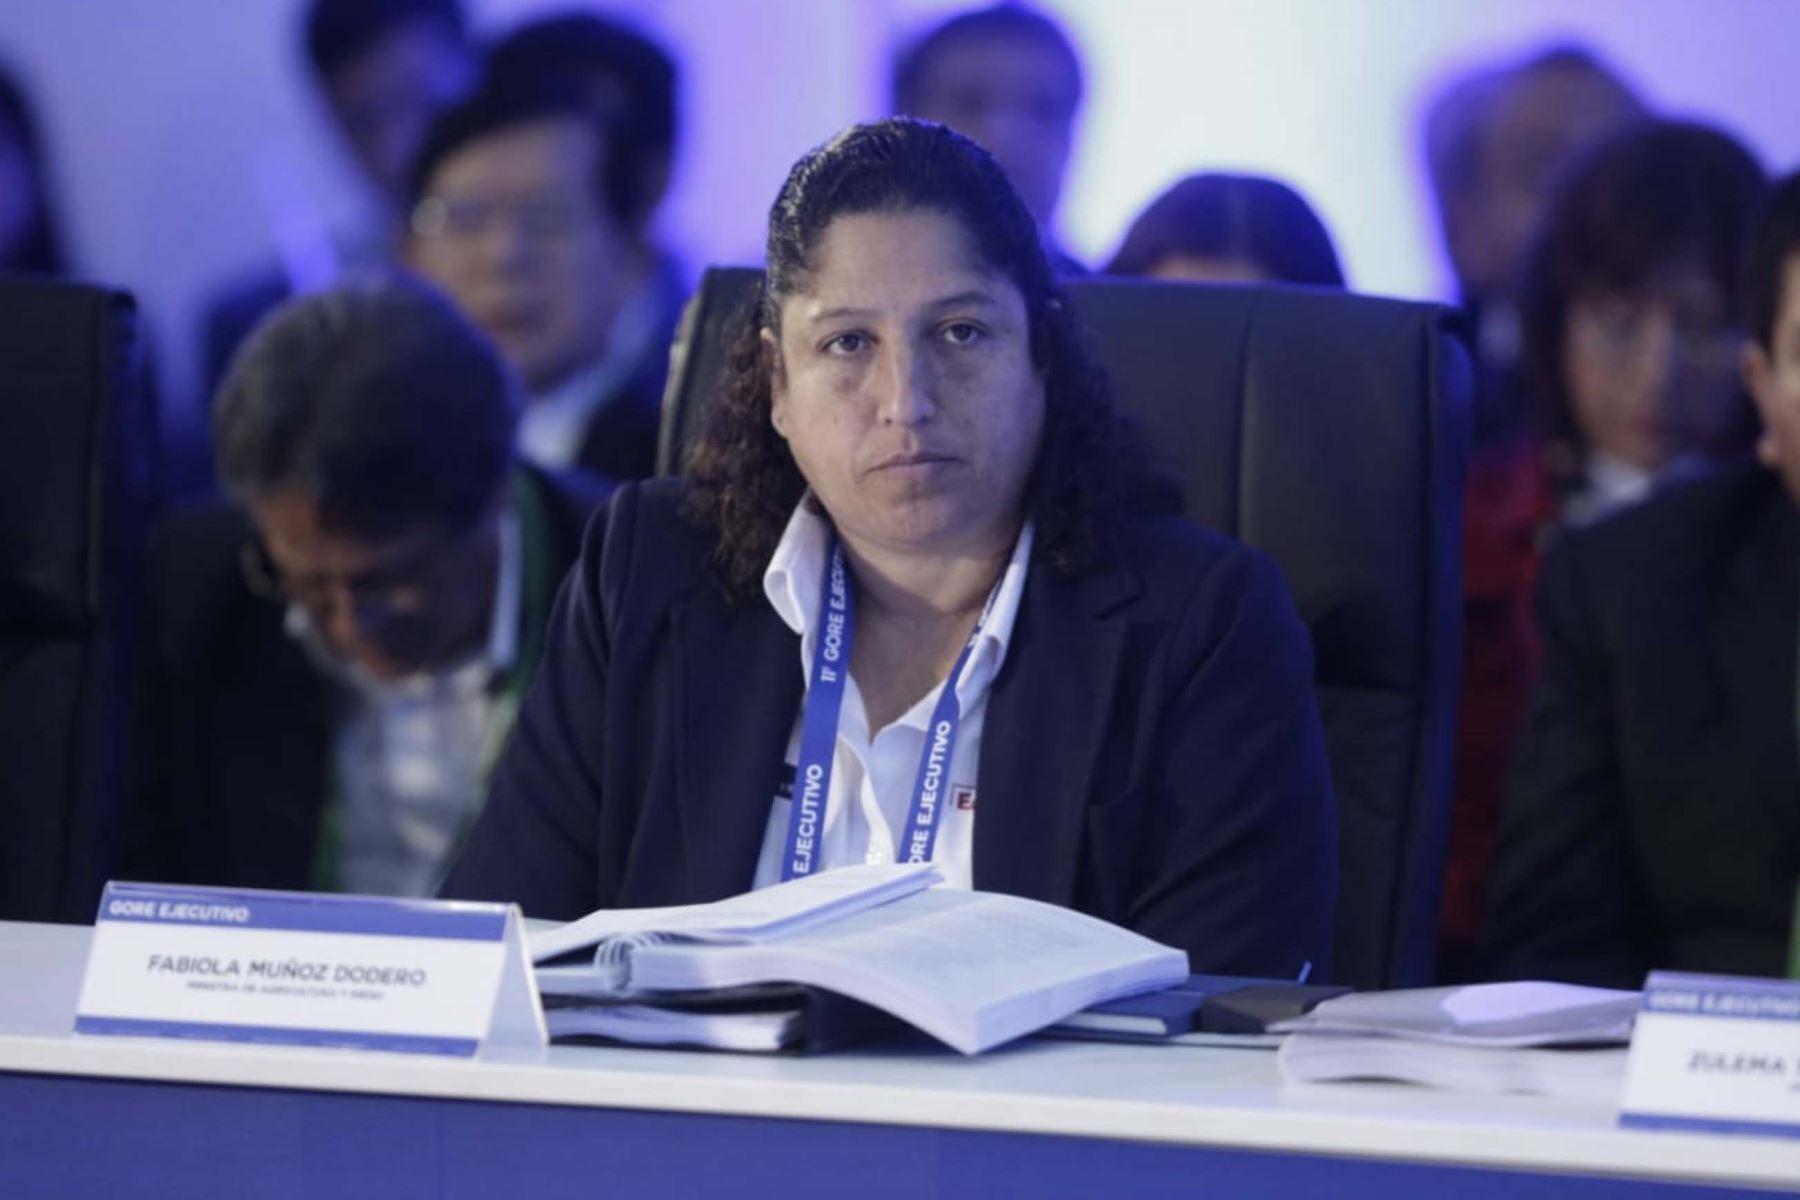 Ministra de Agricultura, Fabiola Muñoz participa  en el 11º Gore Ejecutivo en la Fortaleza Real Felipe del Callao.  Foto:ANDINA/PCM